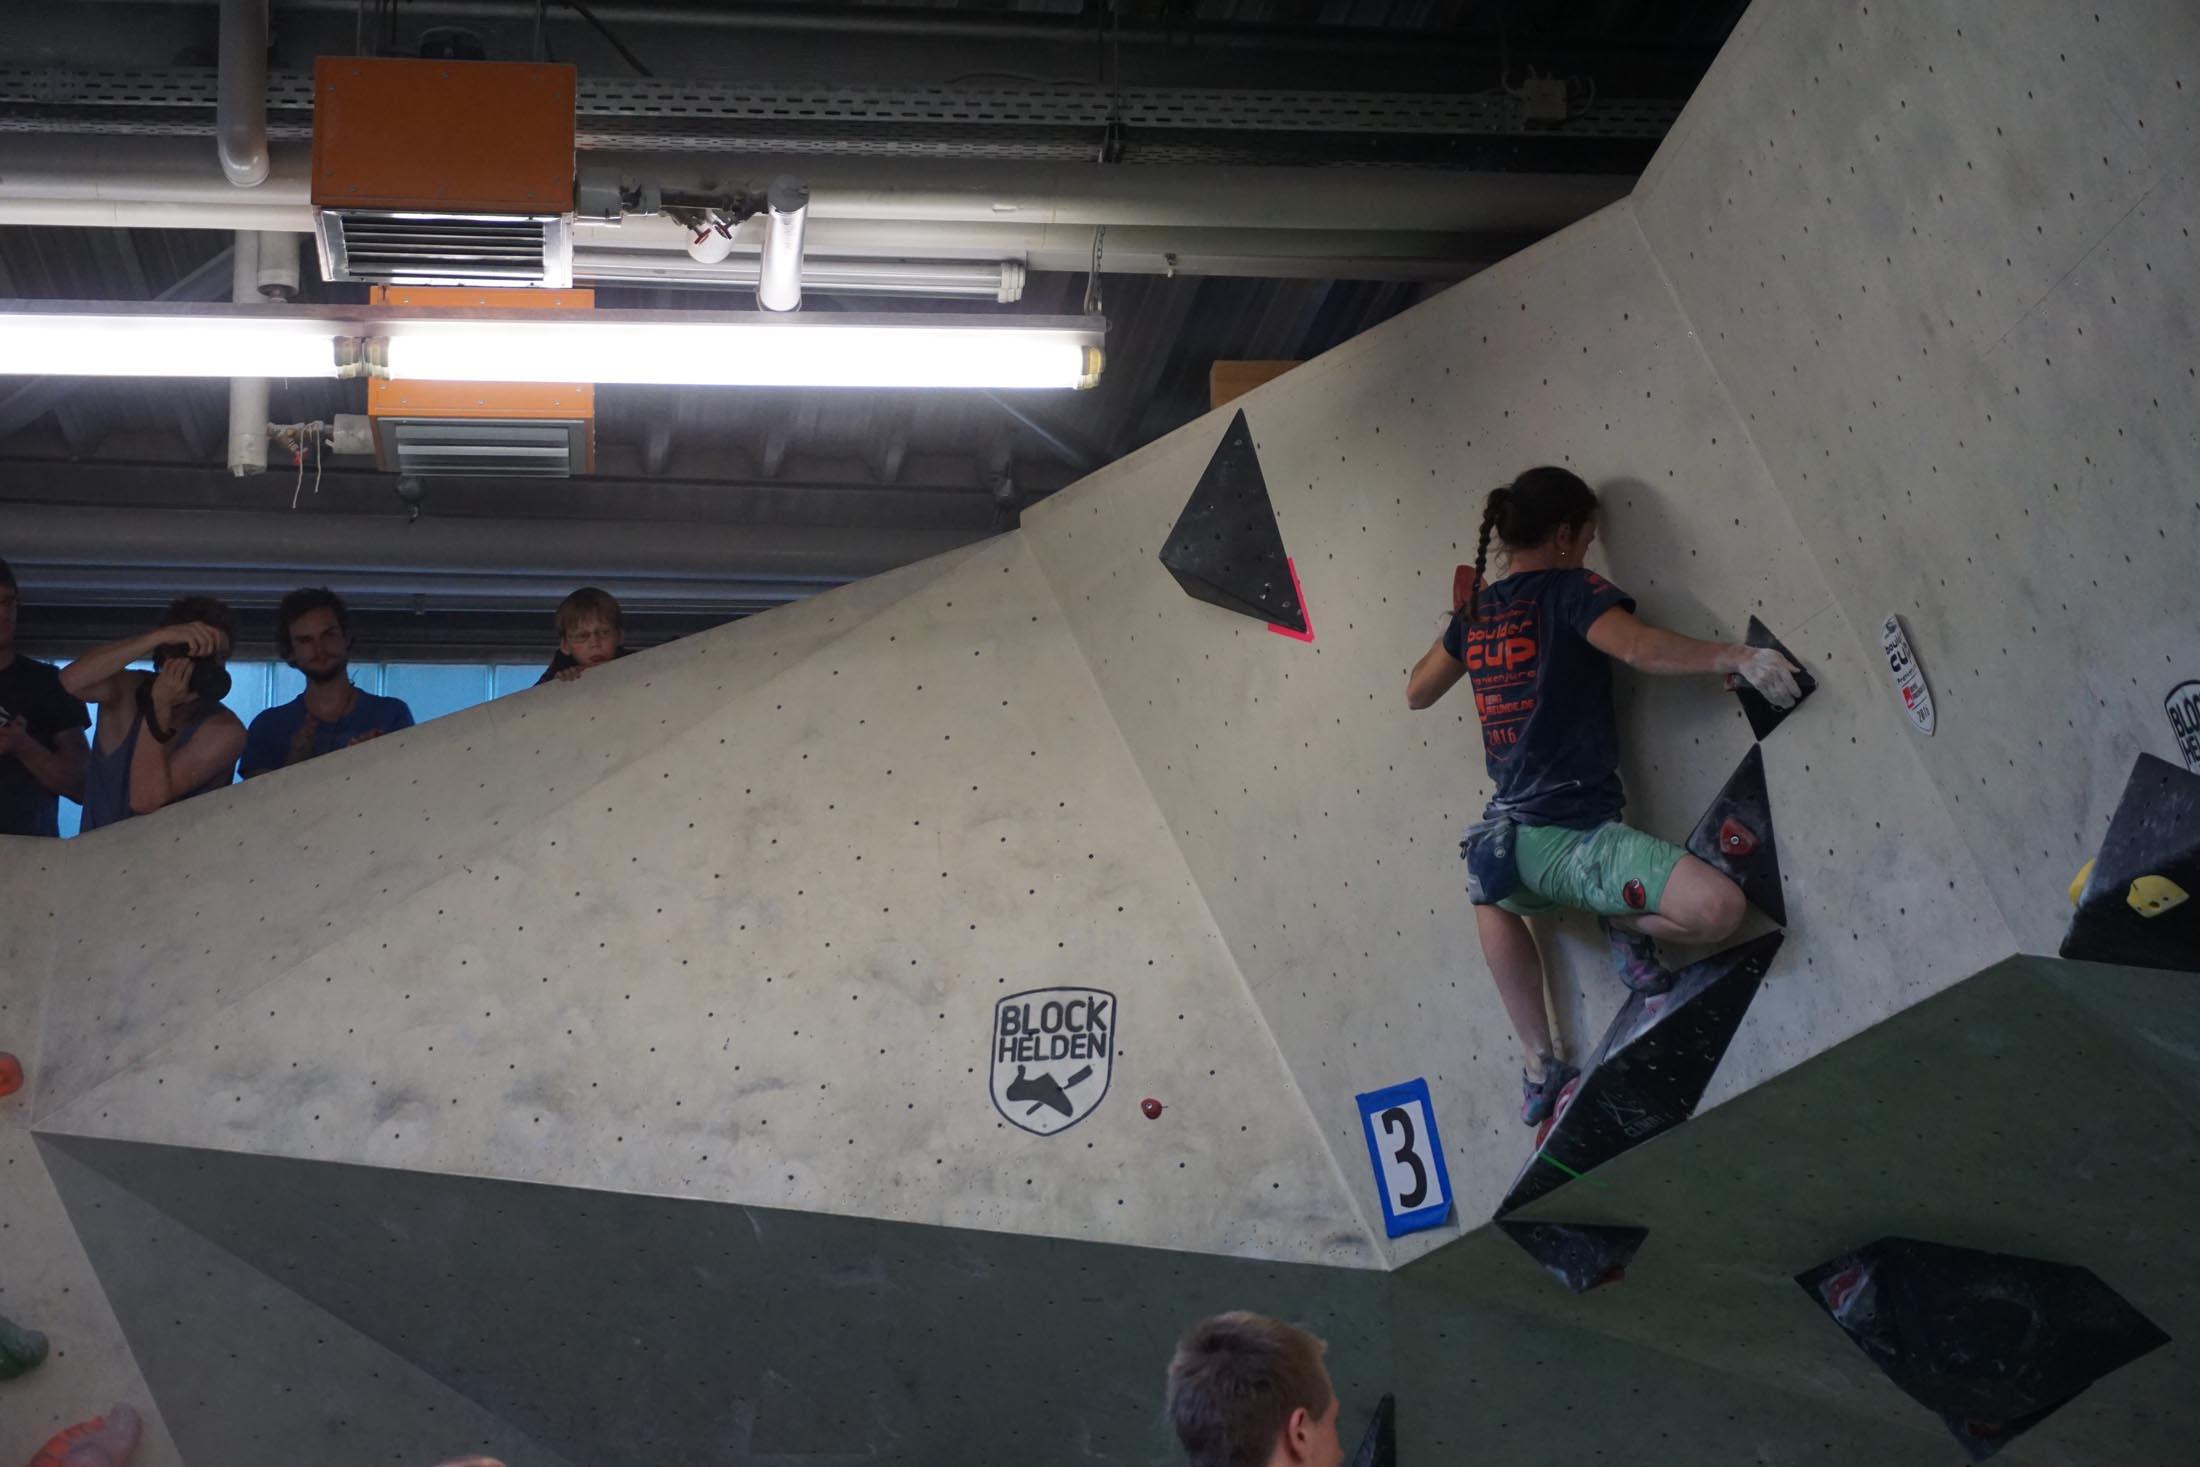 Finale, internationaler bouldercup Frankenjura 2016, BLOCKHELDEN Erlangen, Mammut, Bergfreunde.de, Boulderwettkampf07092016701